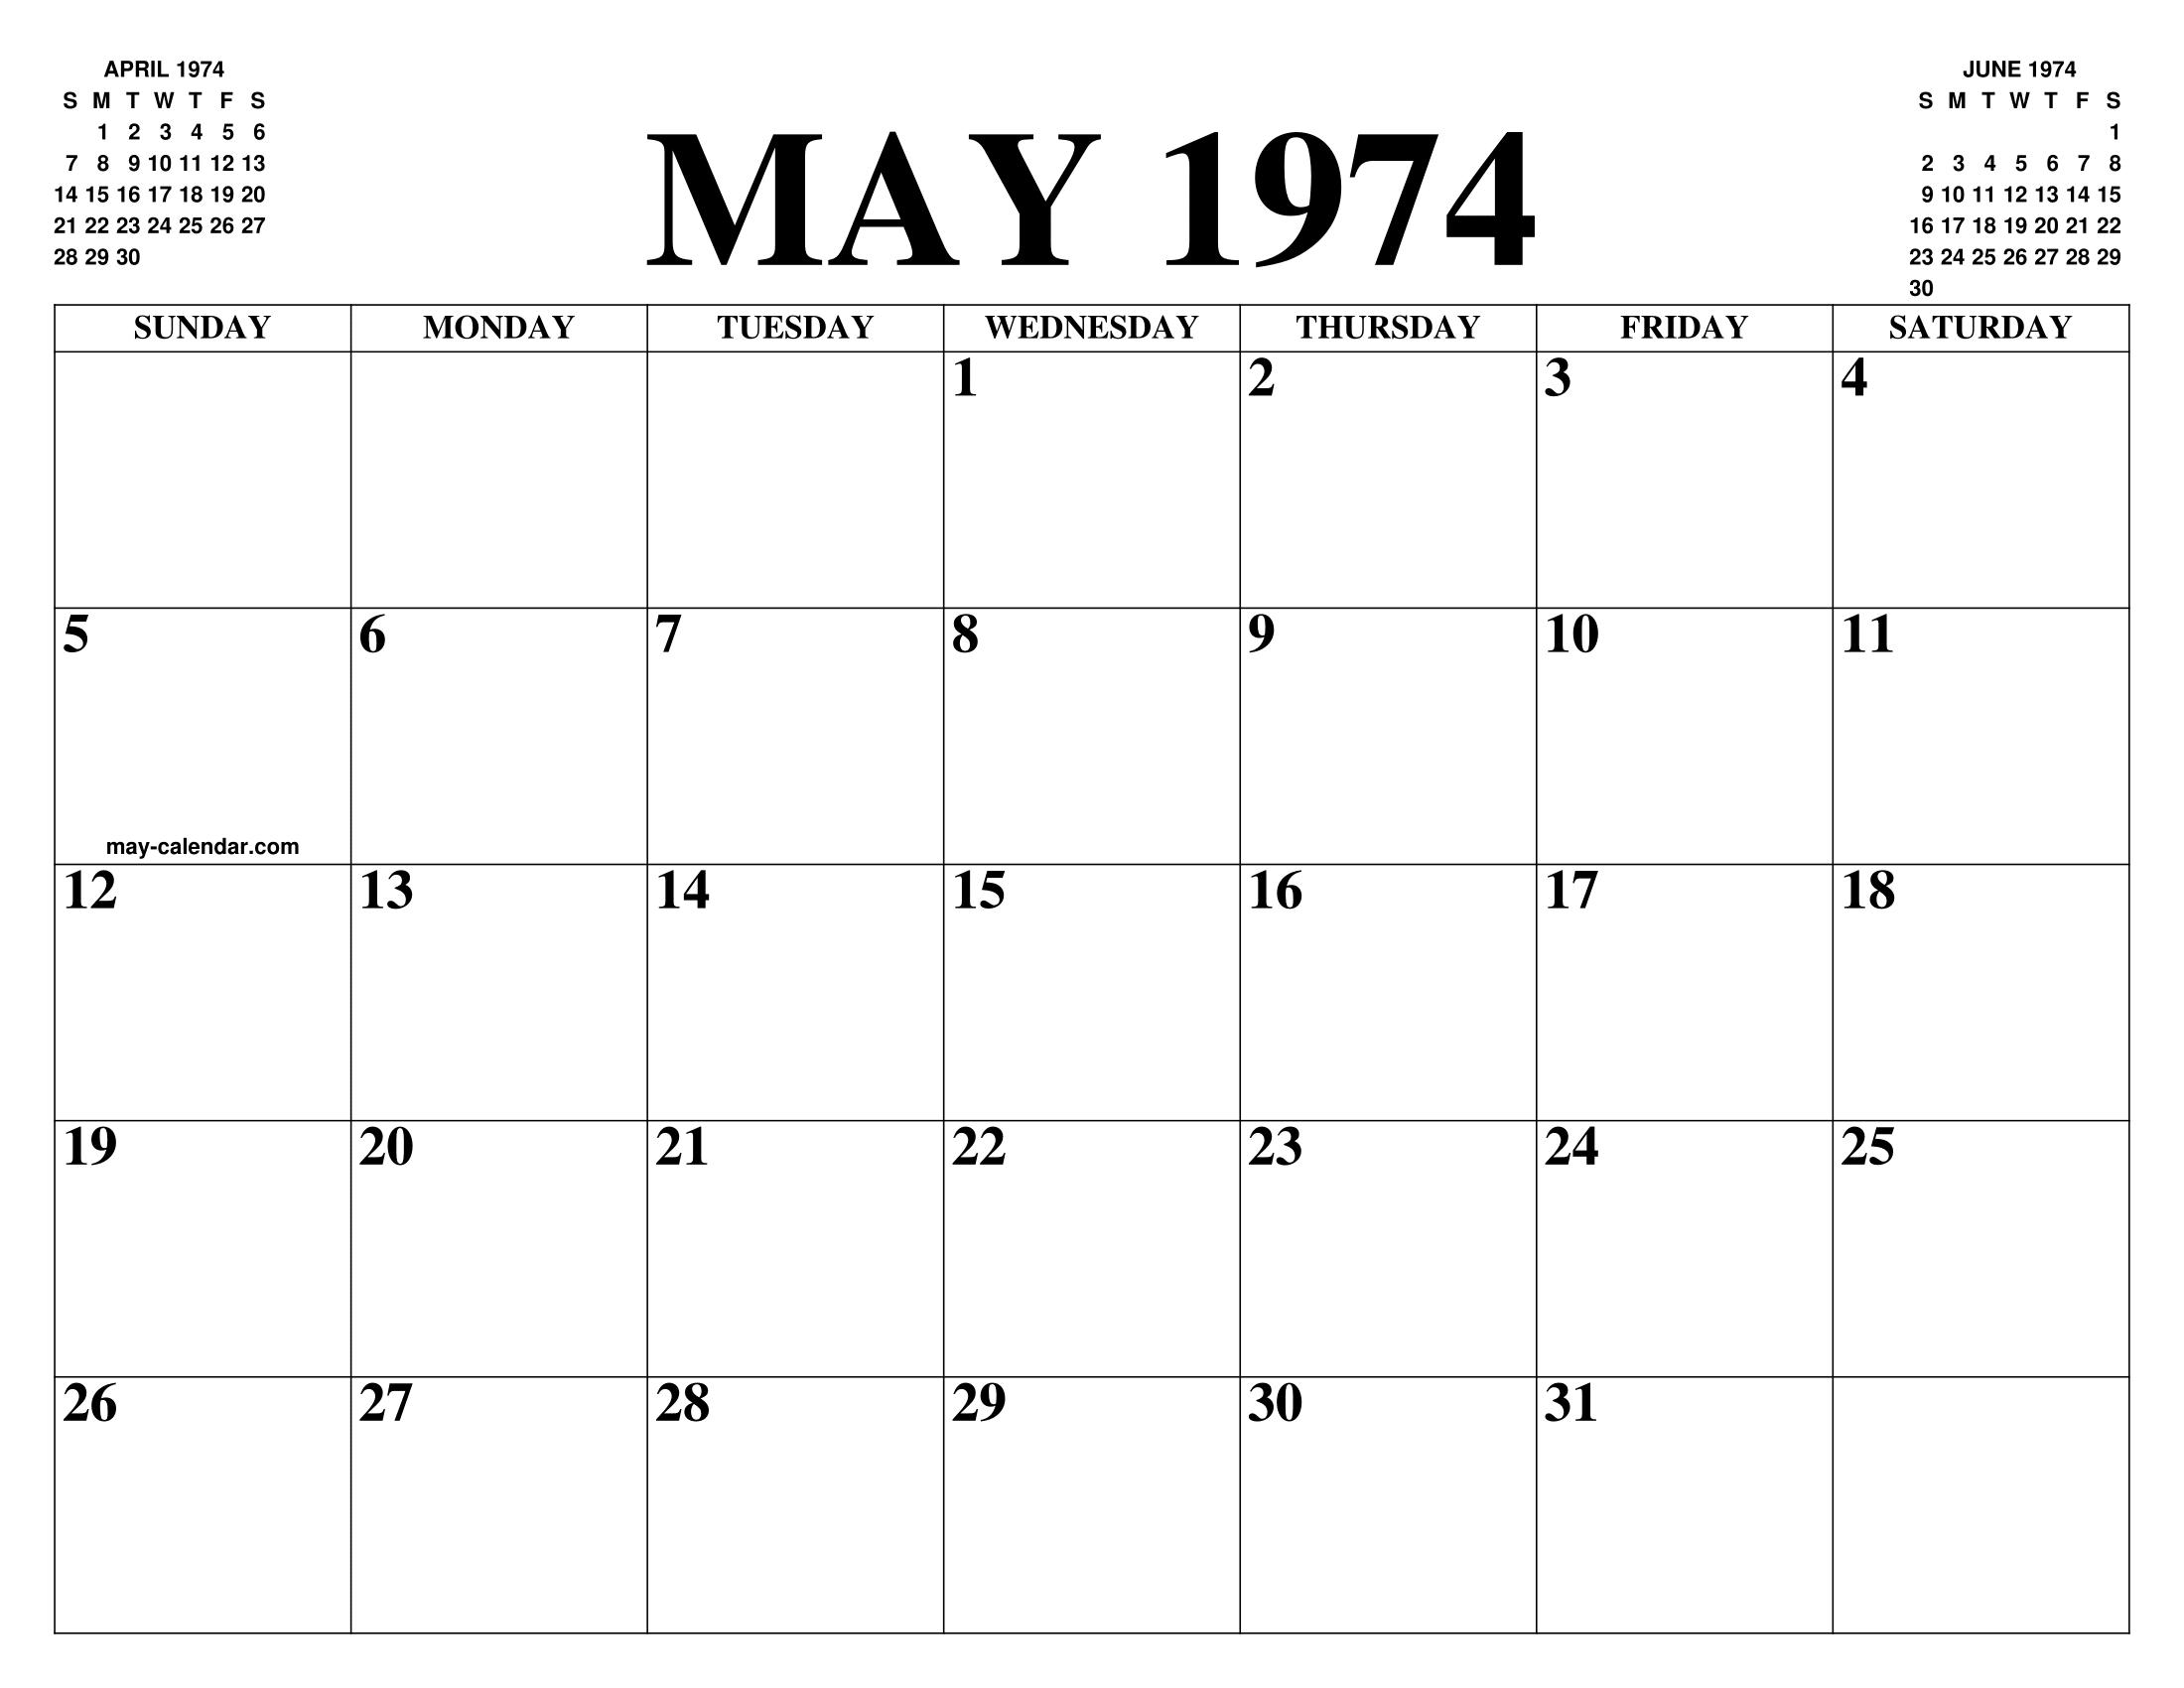 Calendario 1974.May 1974 Calendar Of The Month Free Printable May Calendar